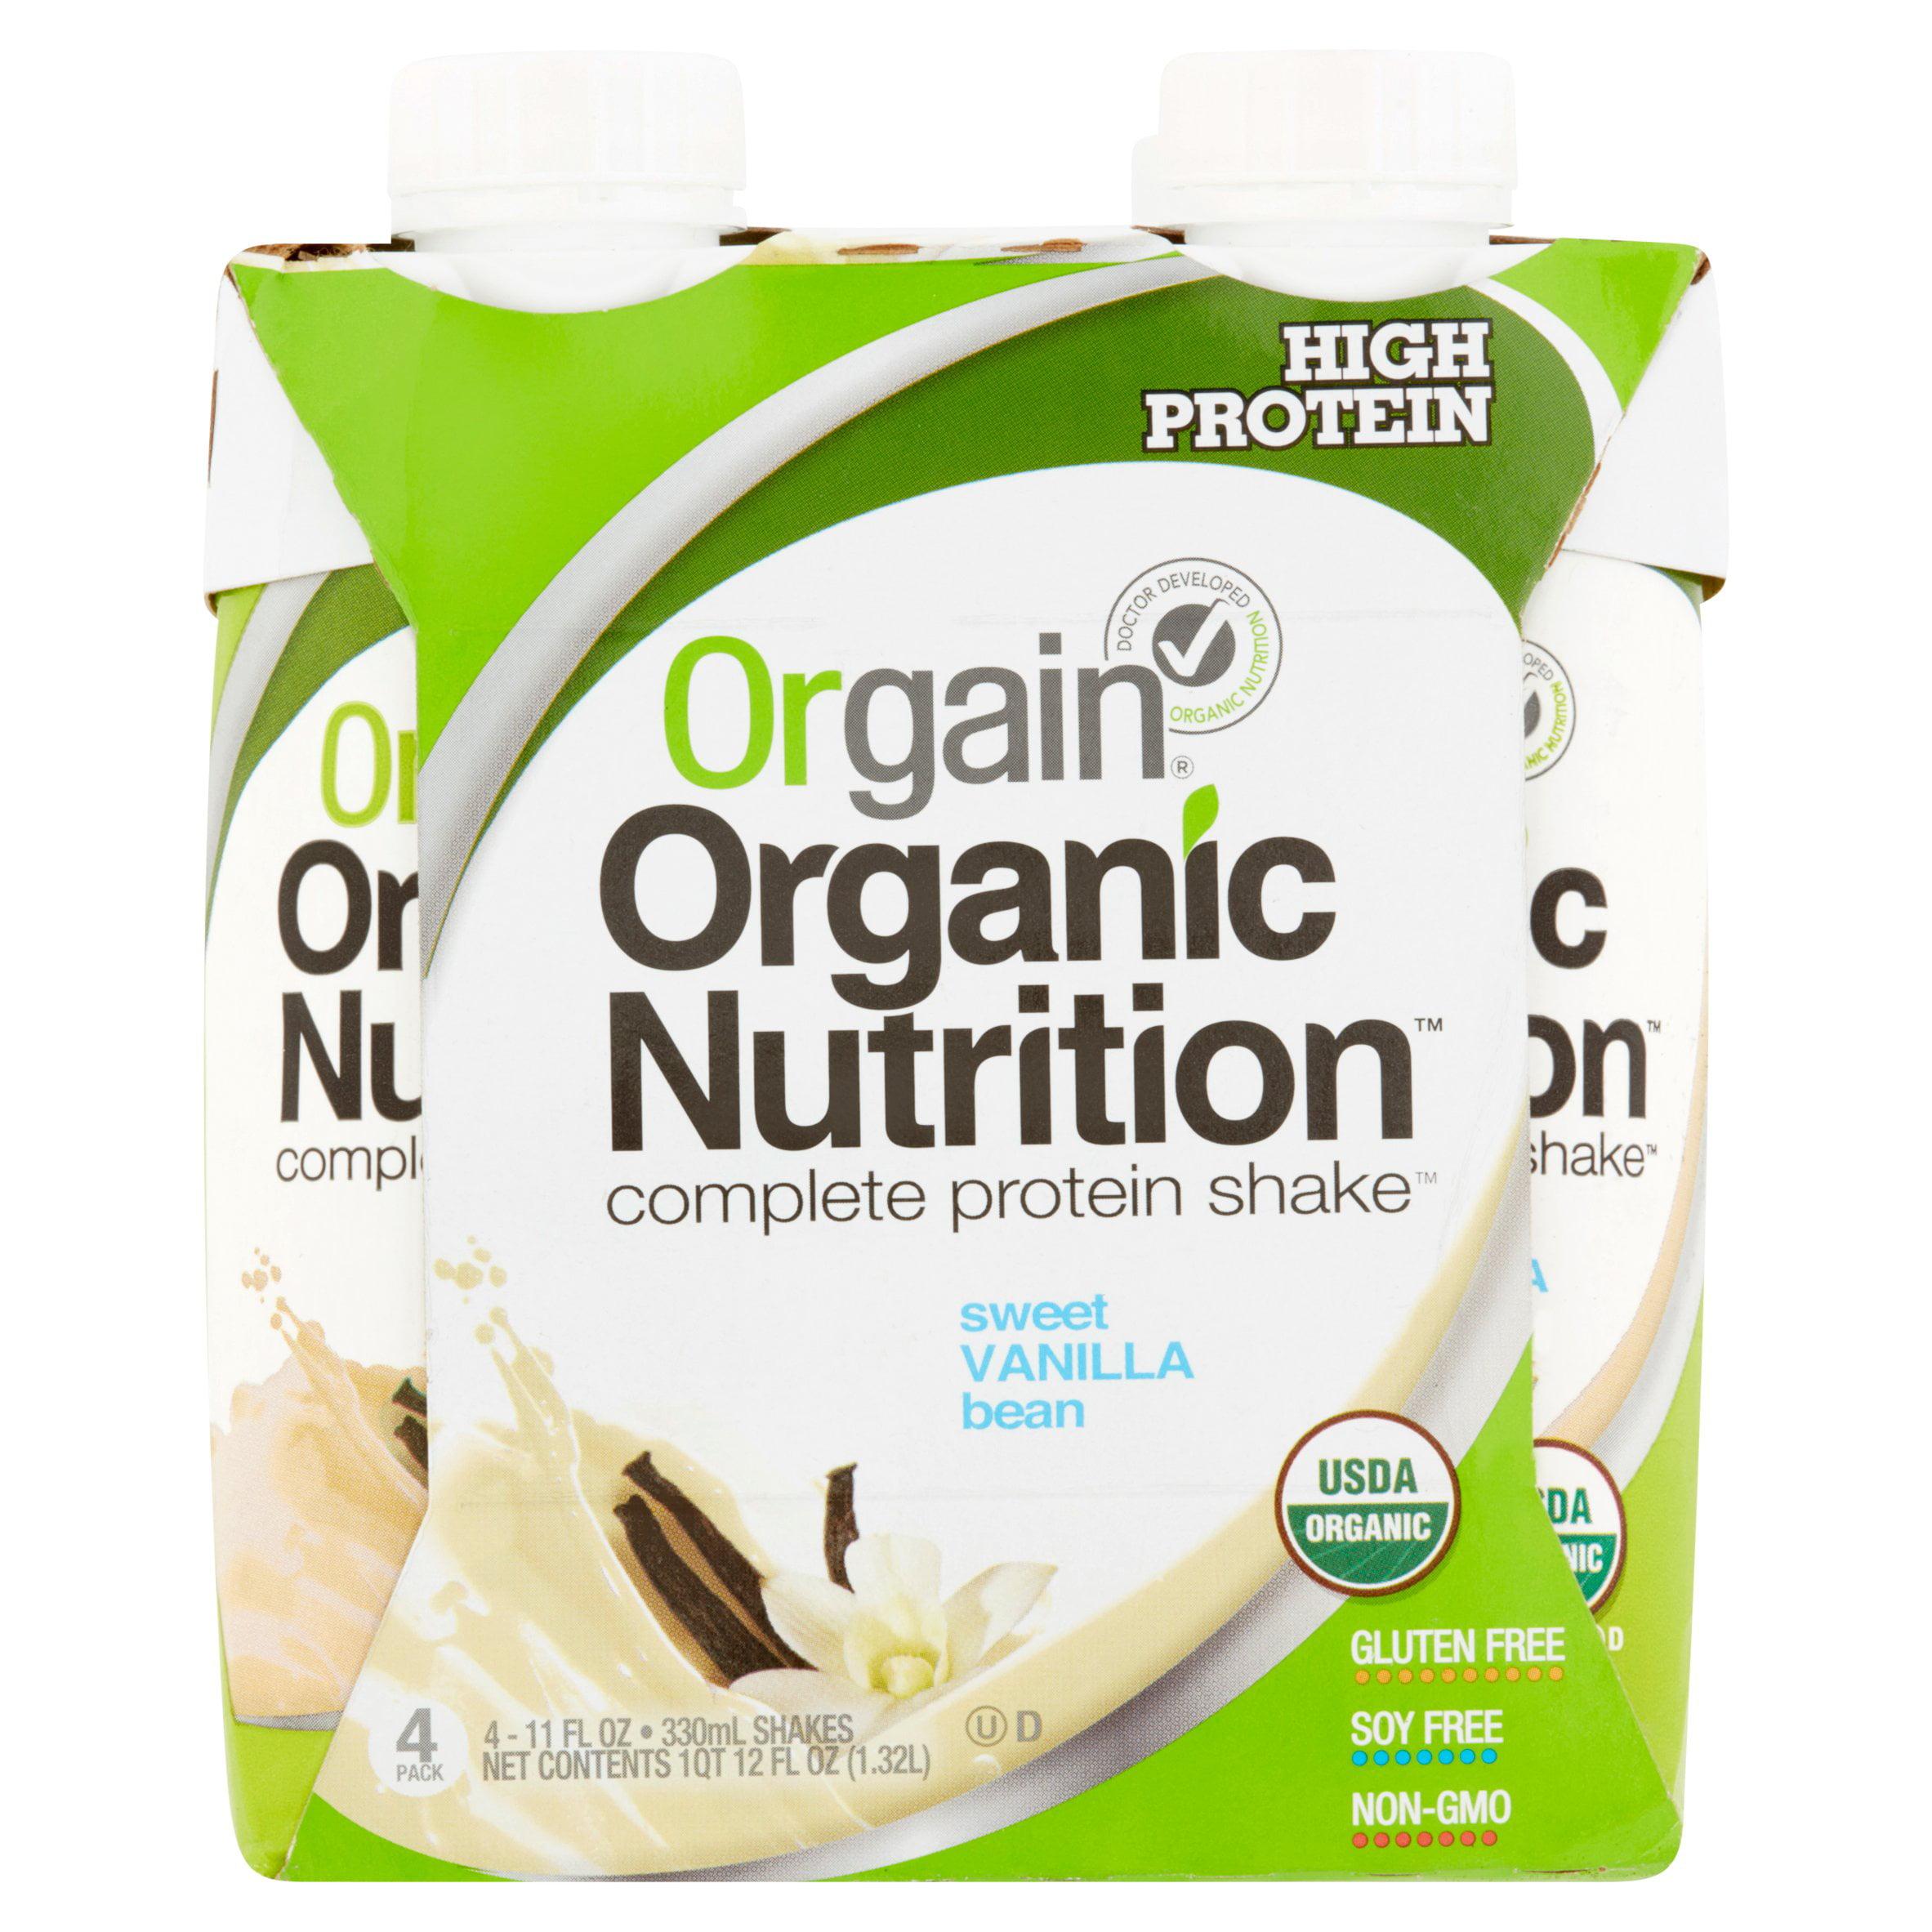 Orgain Organic Shake, 16 Grams of Protein, Vanilla Bean, 11 Oz, 4 Ct